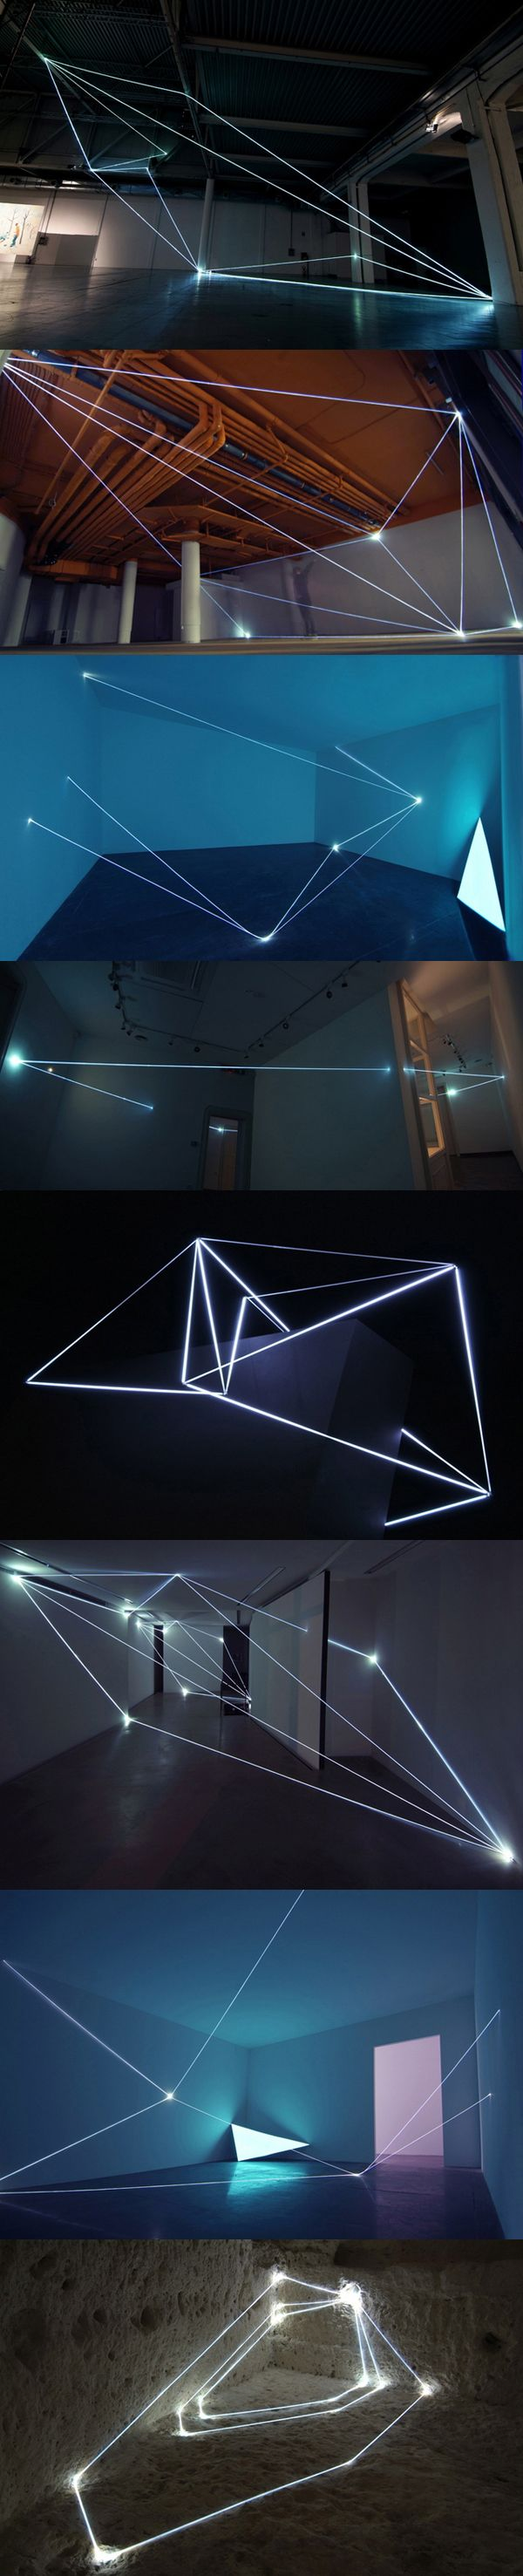 Carlo Bernardini - light installation